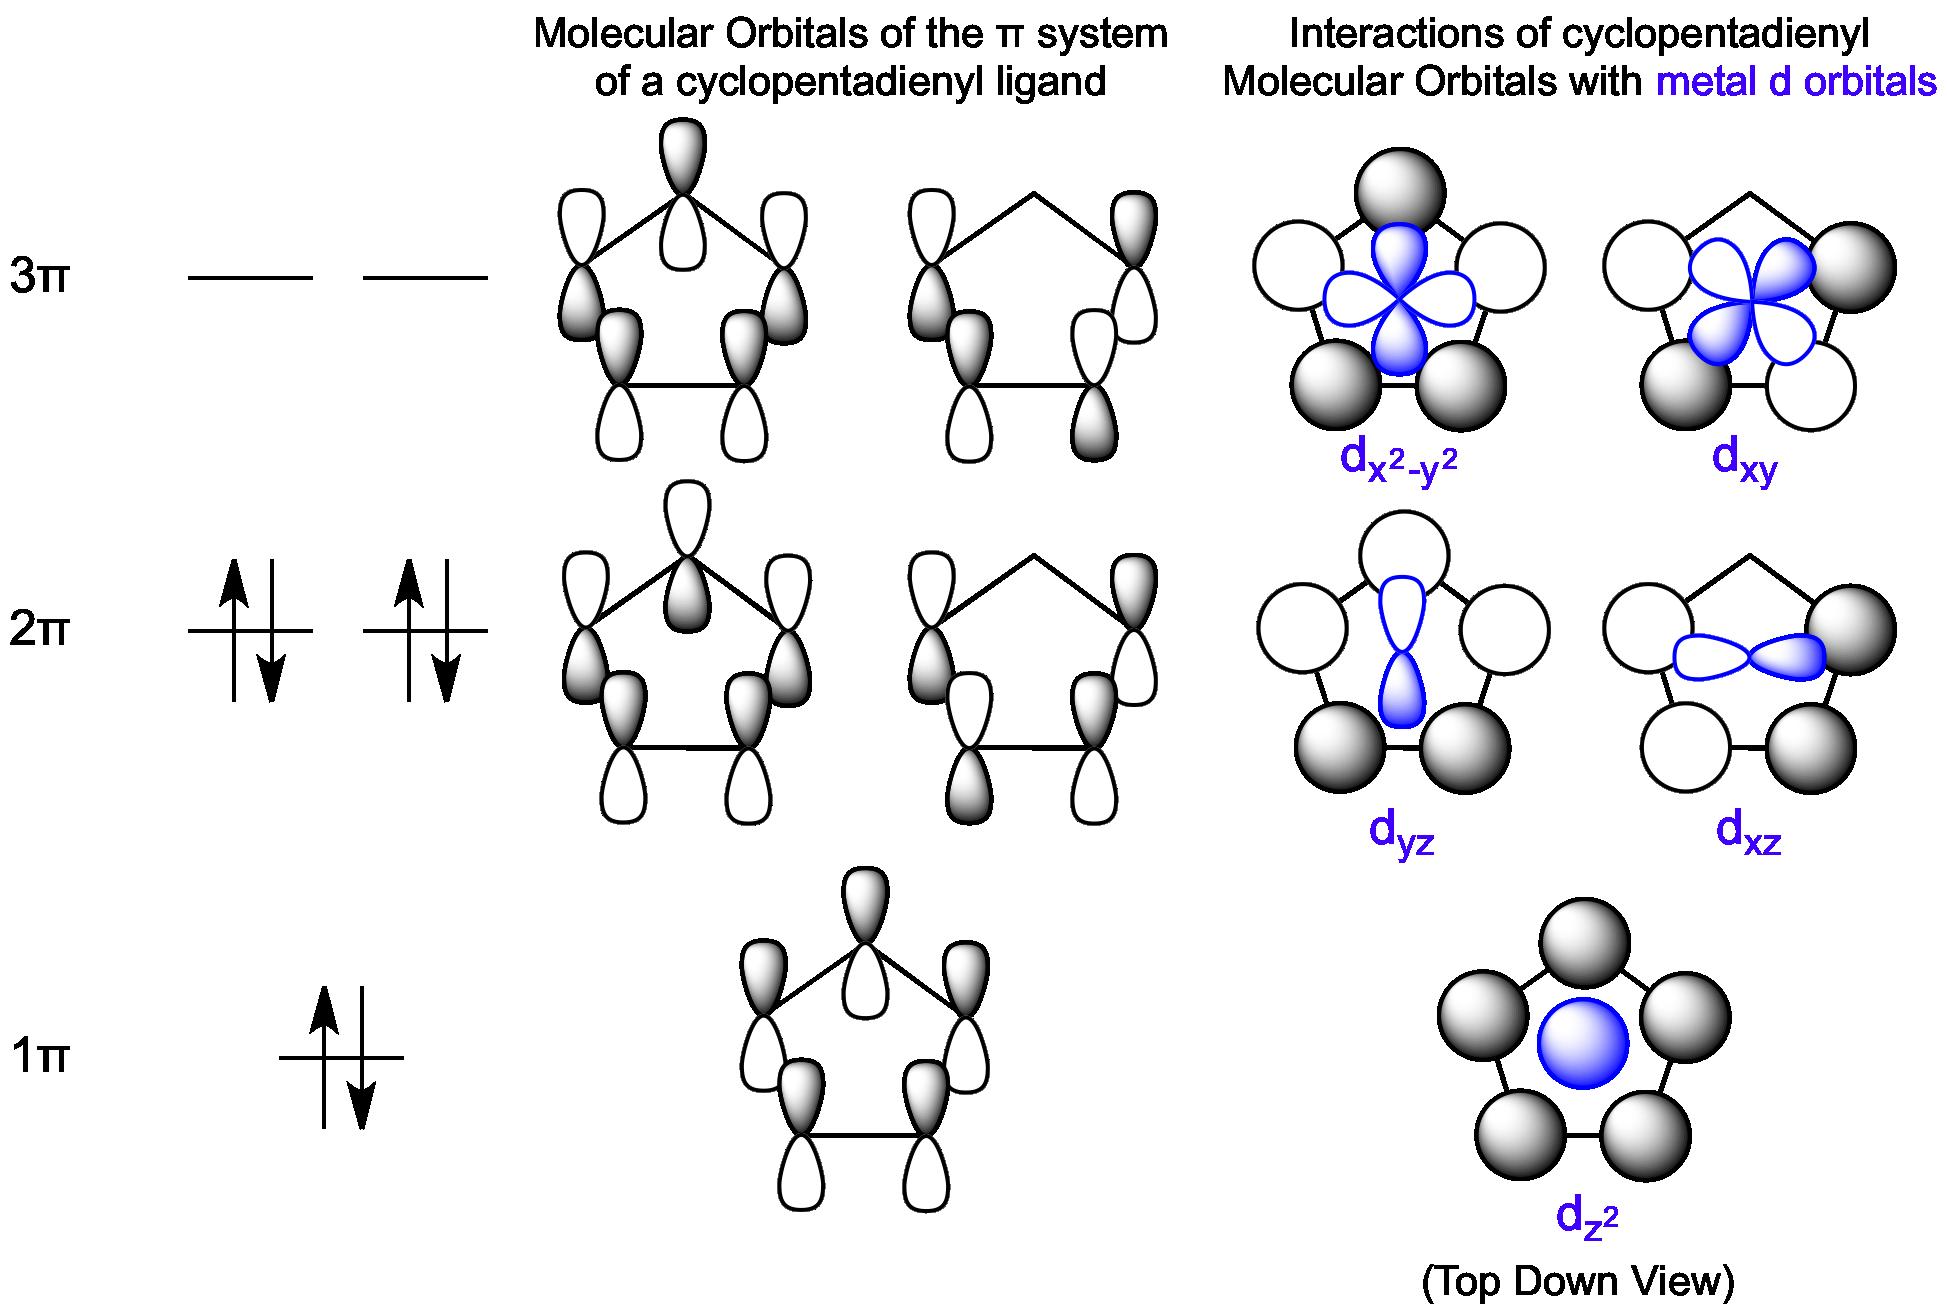 svg library library Interactions between cyclopentadienyl molecular. Drawing orbitals dz2